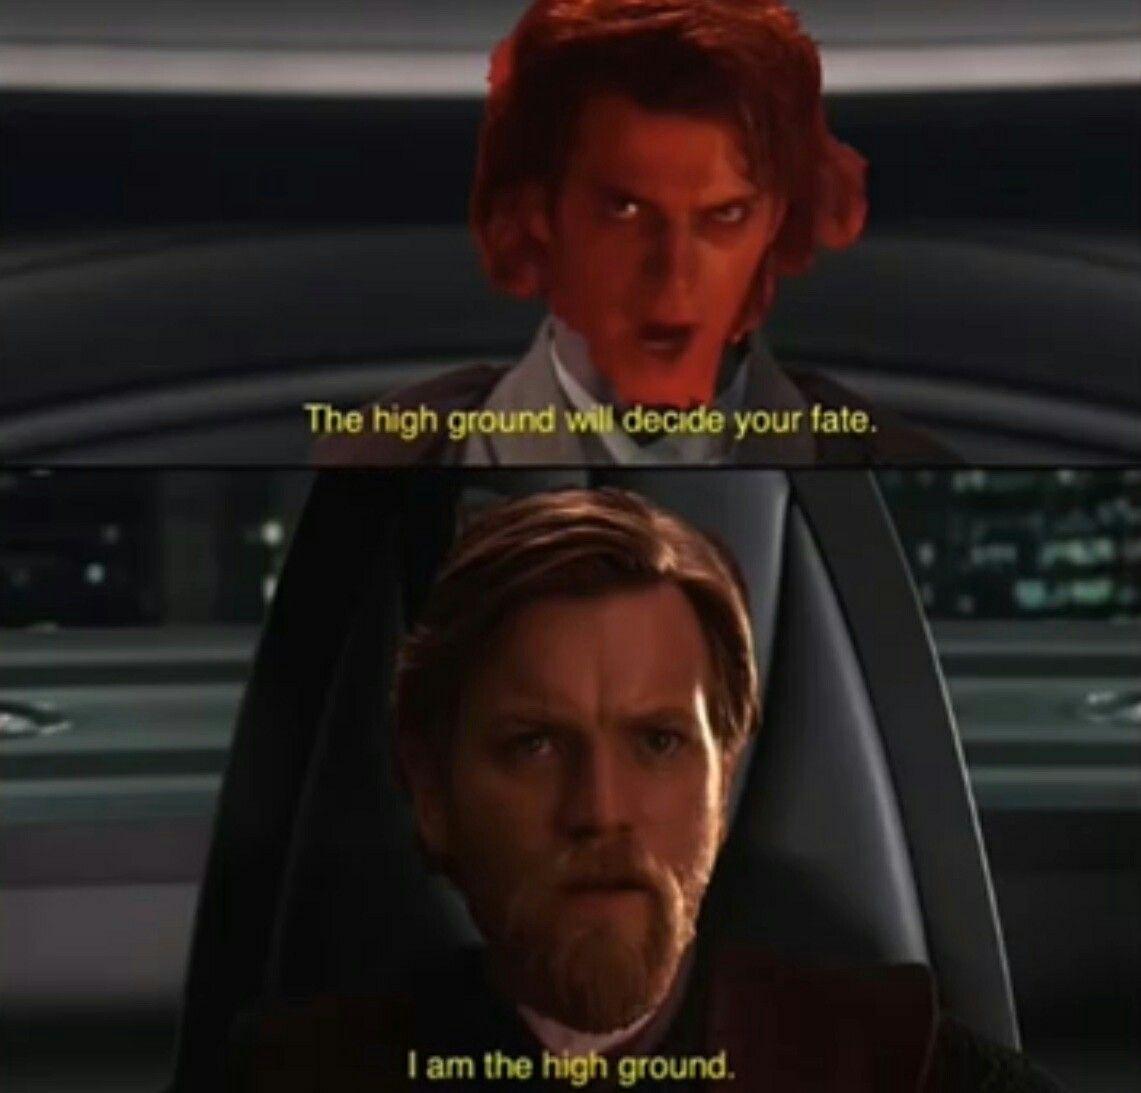 Star Wars Prequel High Ground Meme Star Wars Facts Funny Star Wars Memes Star Wars Empire